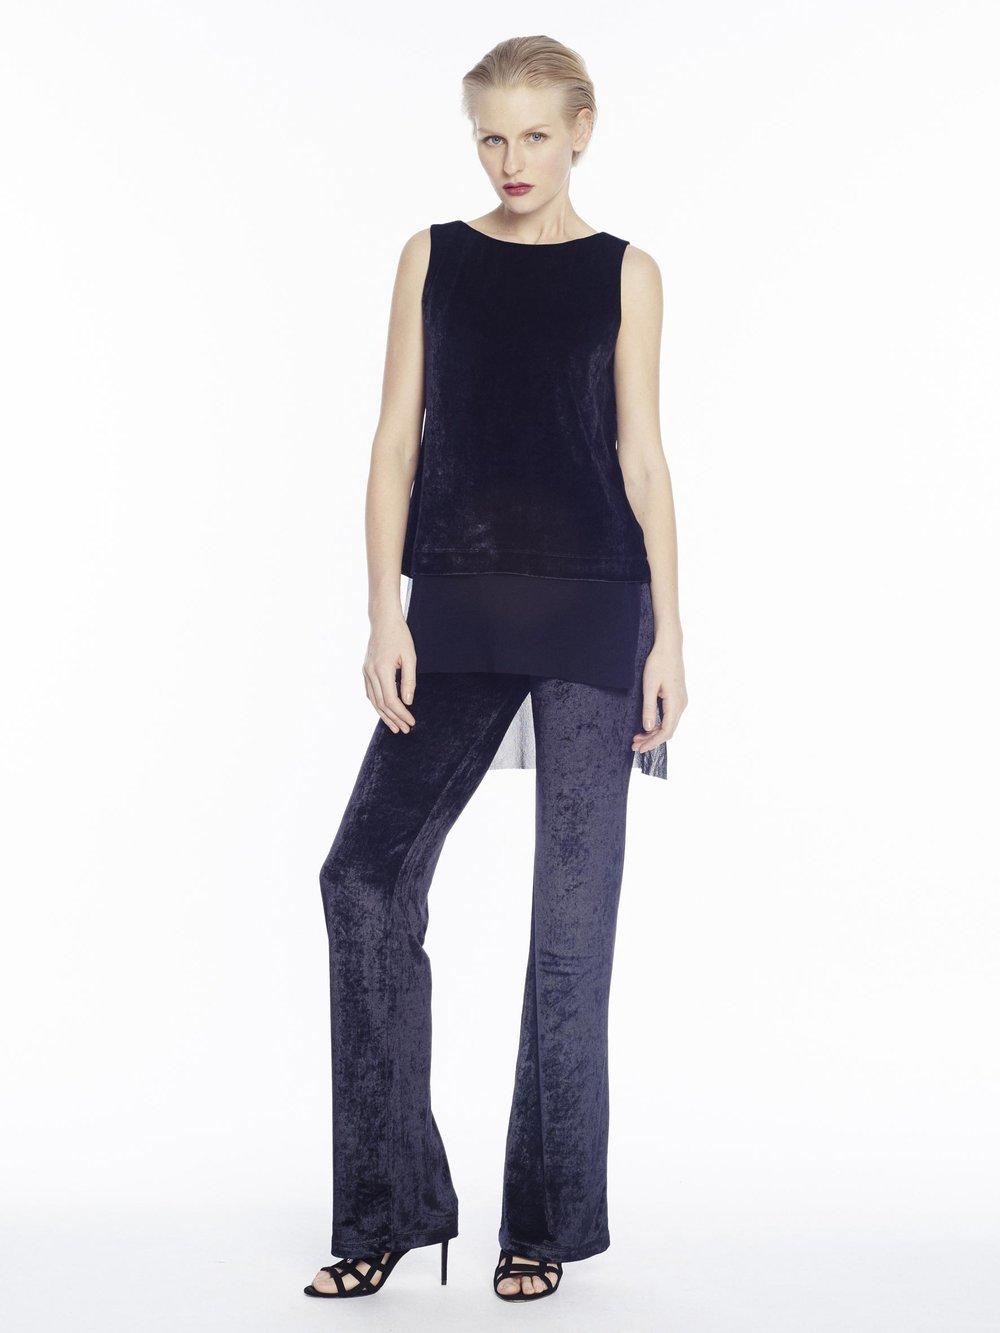 F71720 top s/m - F71725 pantalone